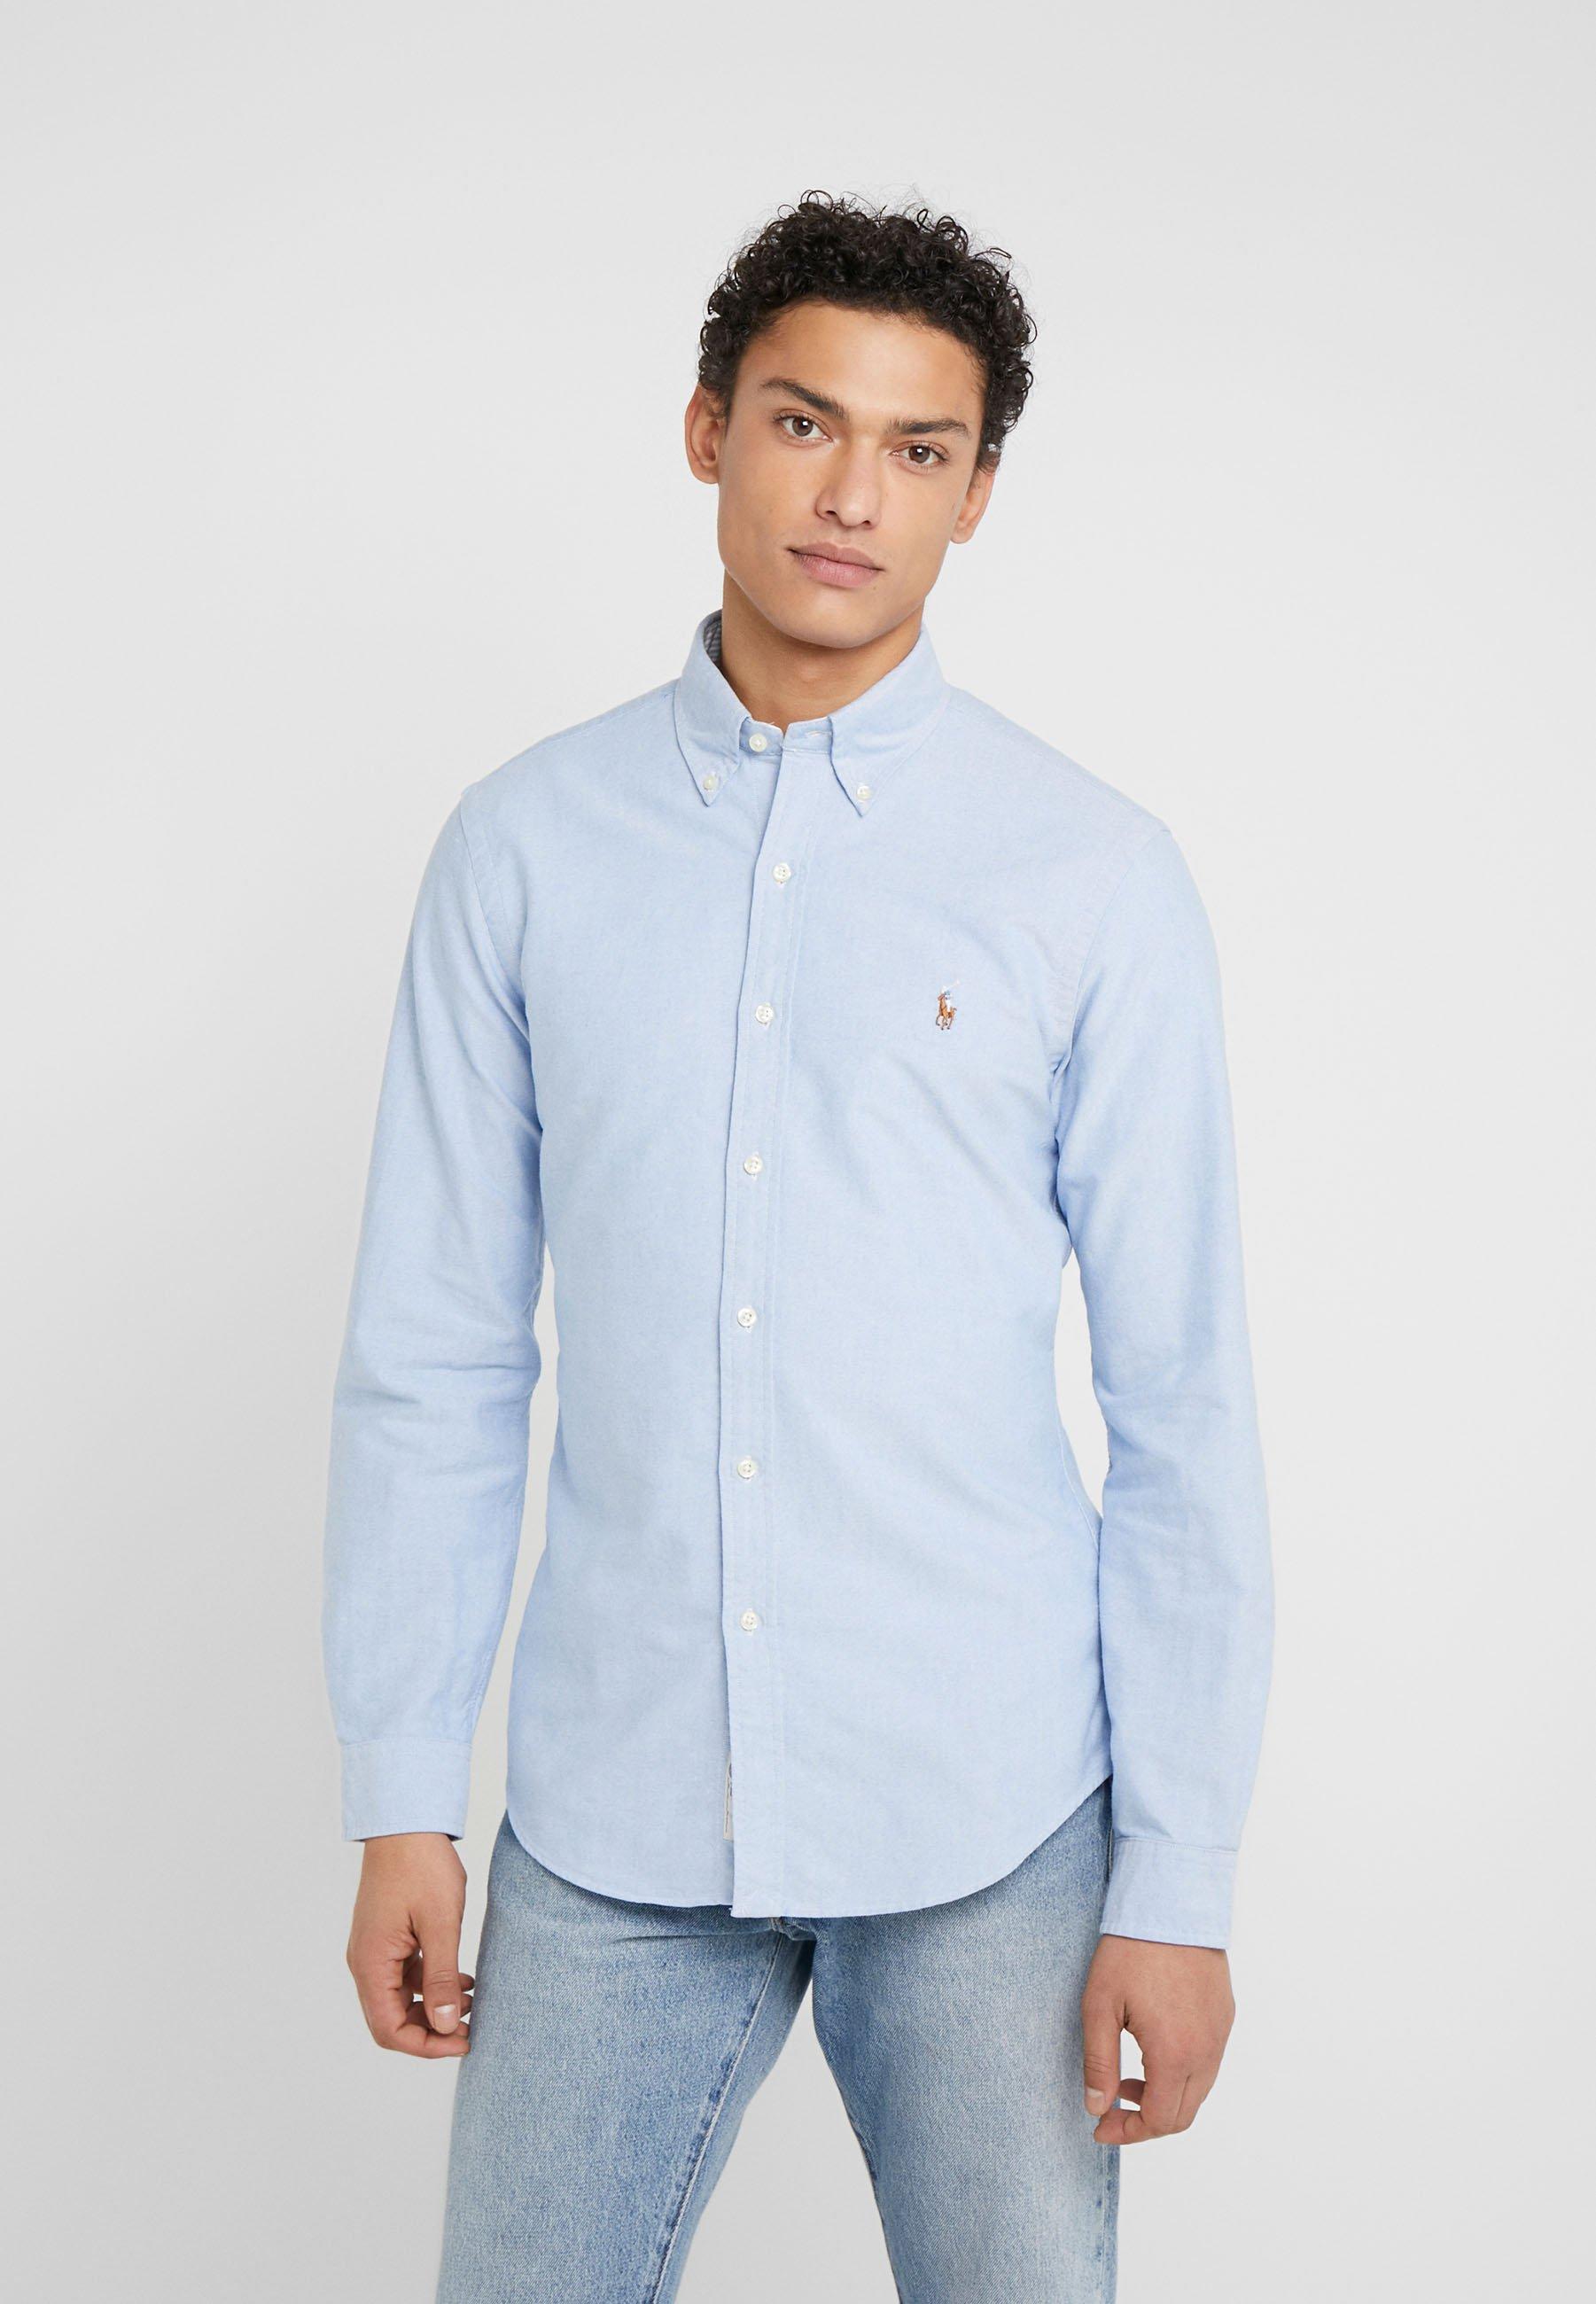 Polo Ralph Lauren OXFORD SLIM FIT - Koszula - BLUE